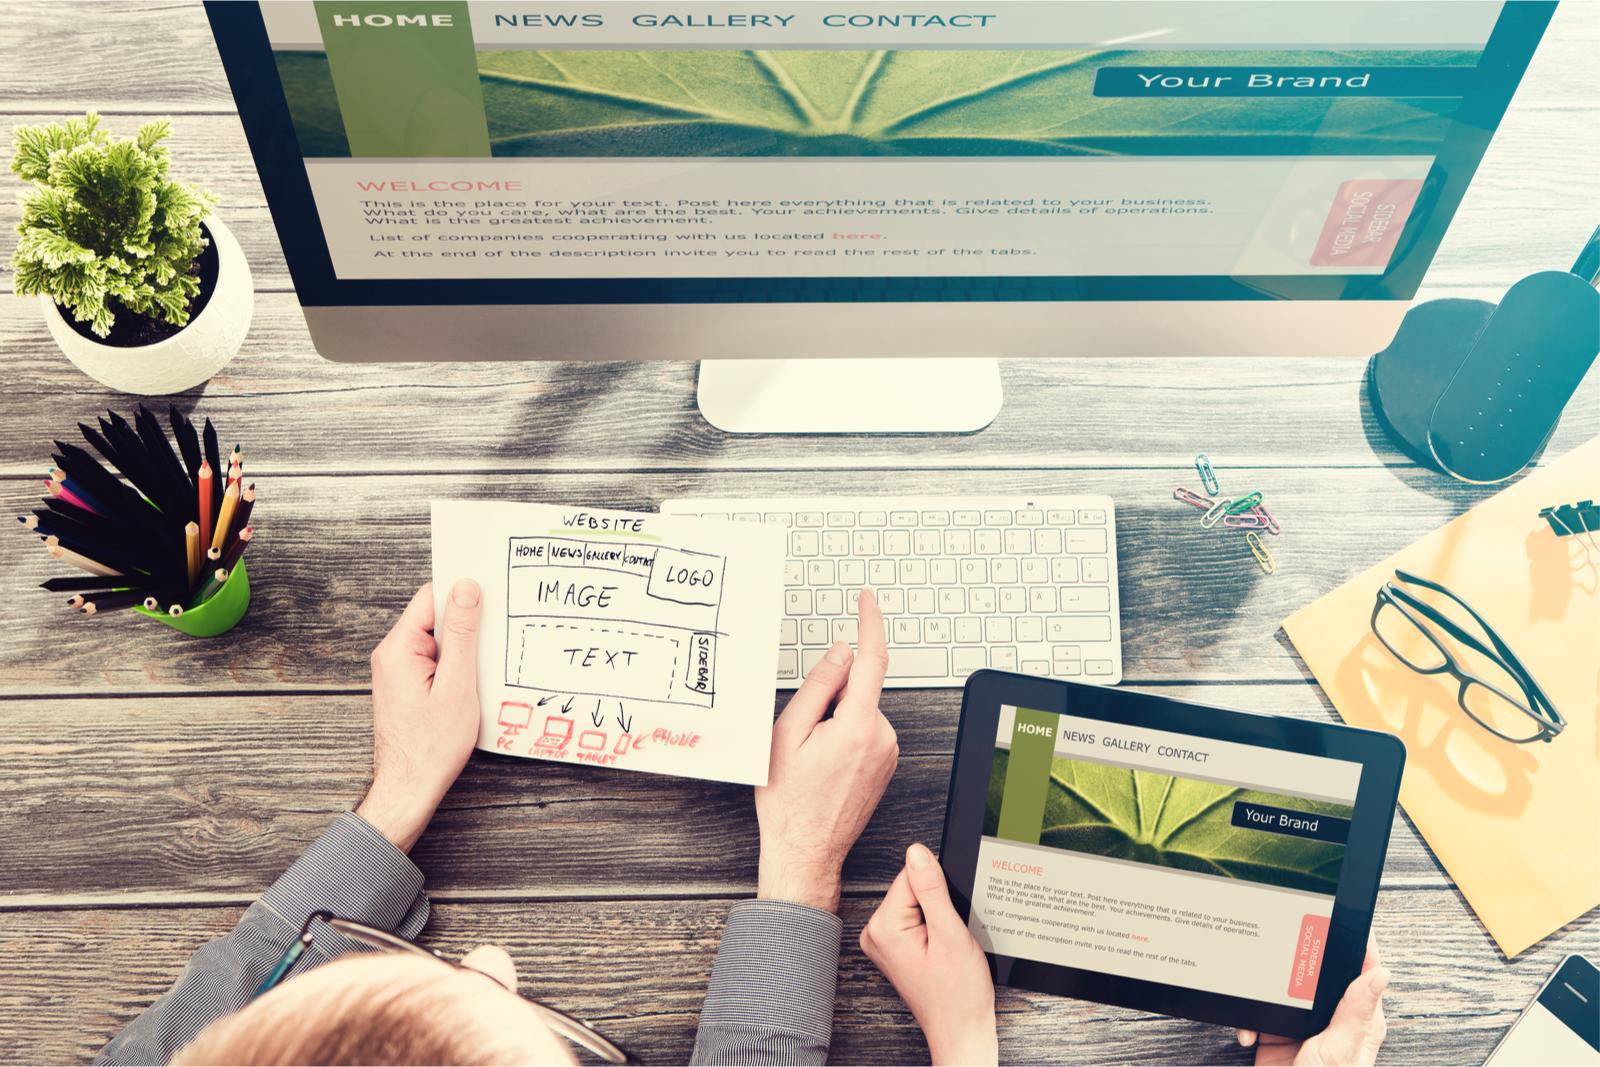 Website designers work on layout